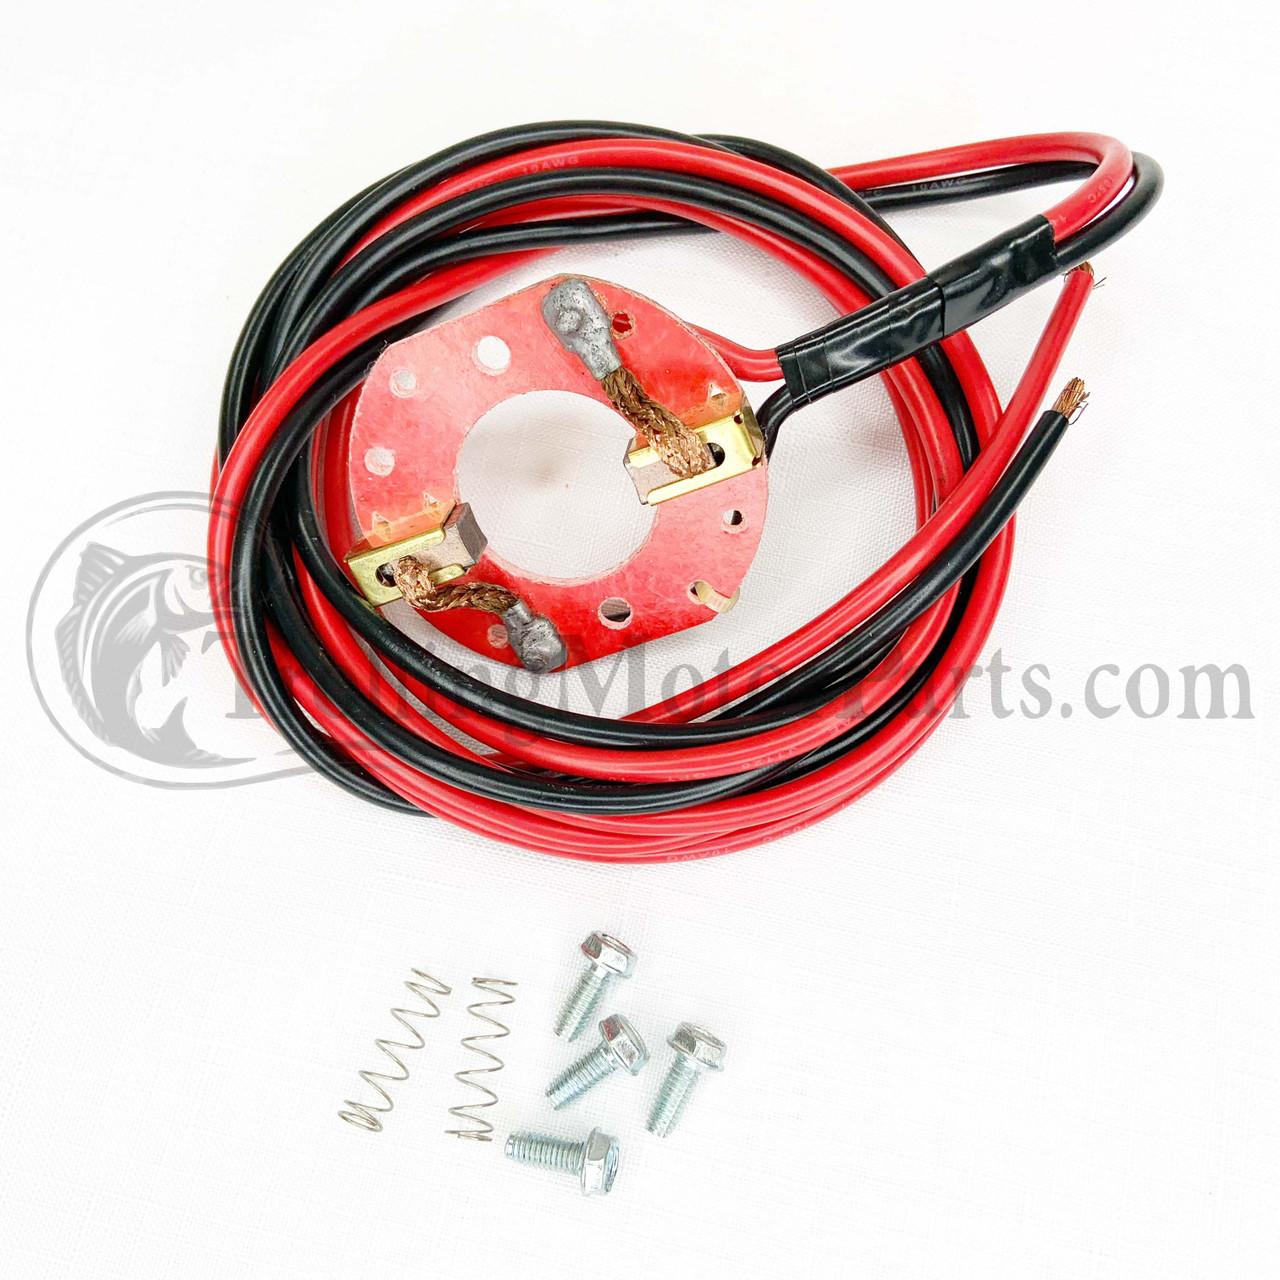 minn kota trolling motor wiring harness motor guide brush plate kit  w wires  trollingmotorparts com  motor guide brush plate kit  w wires